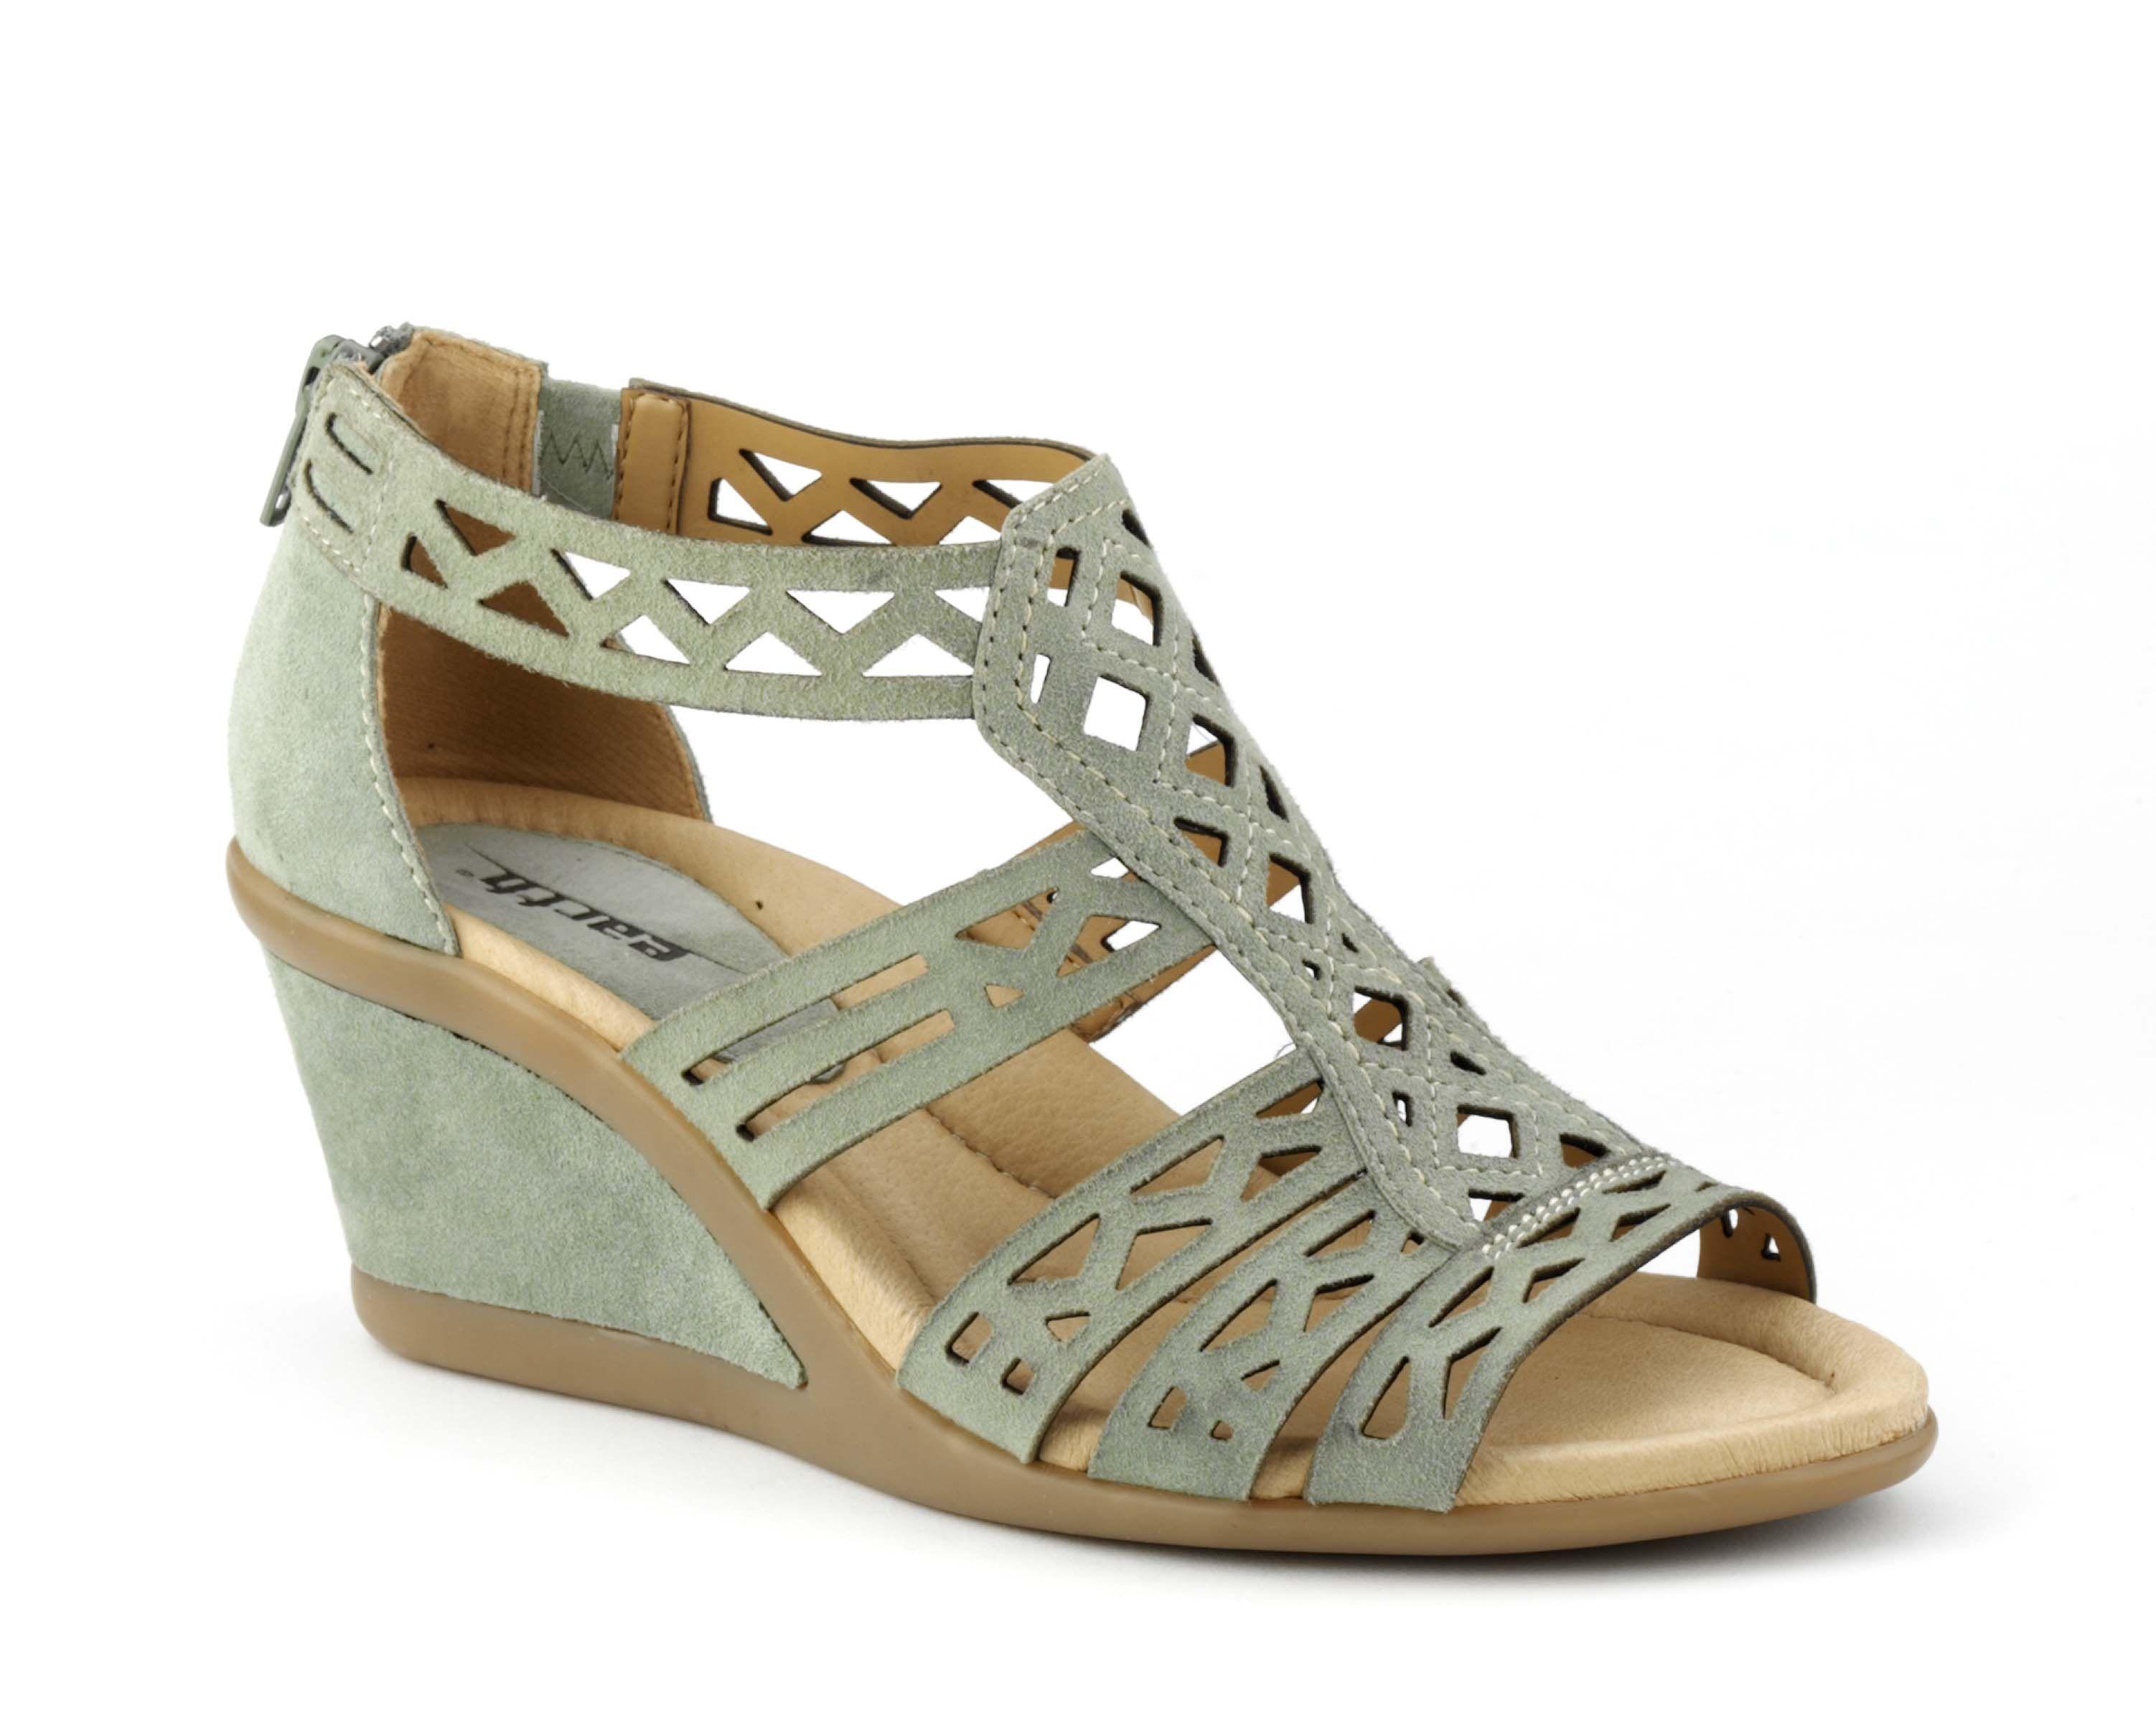 795e6a36674 Woman ·  EarthFootwear Petal shoe  wedges  sandals for Spring  14. http